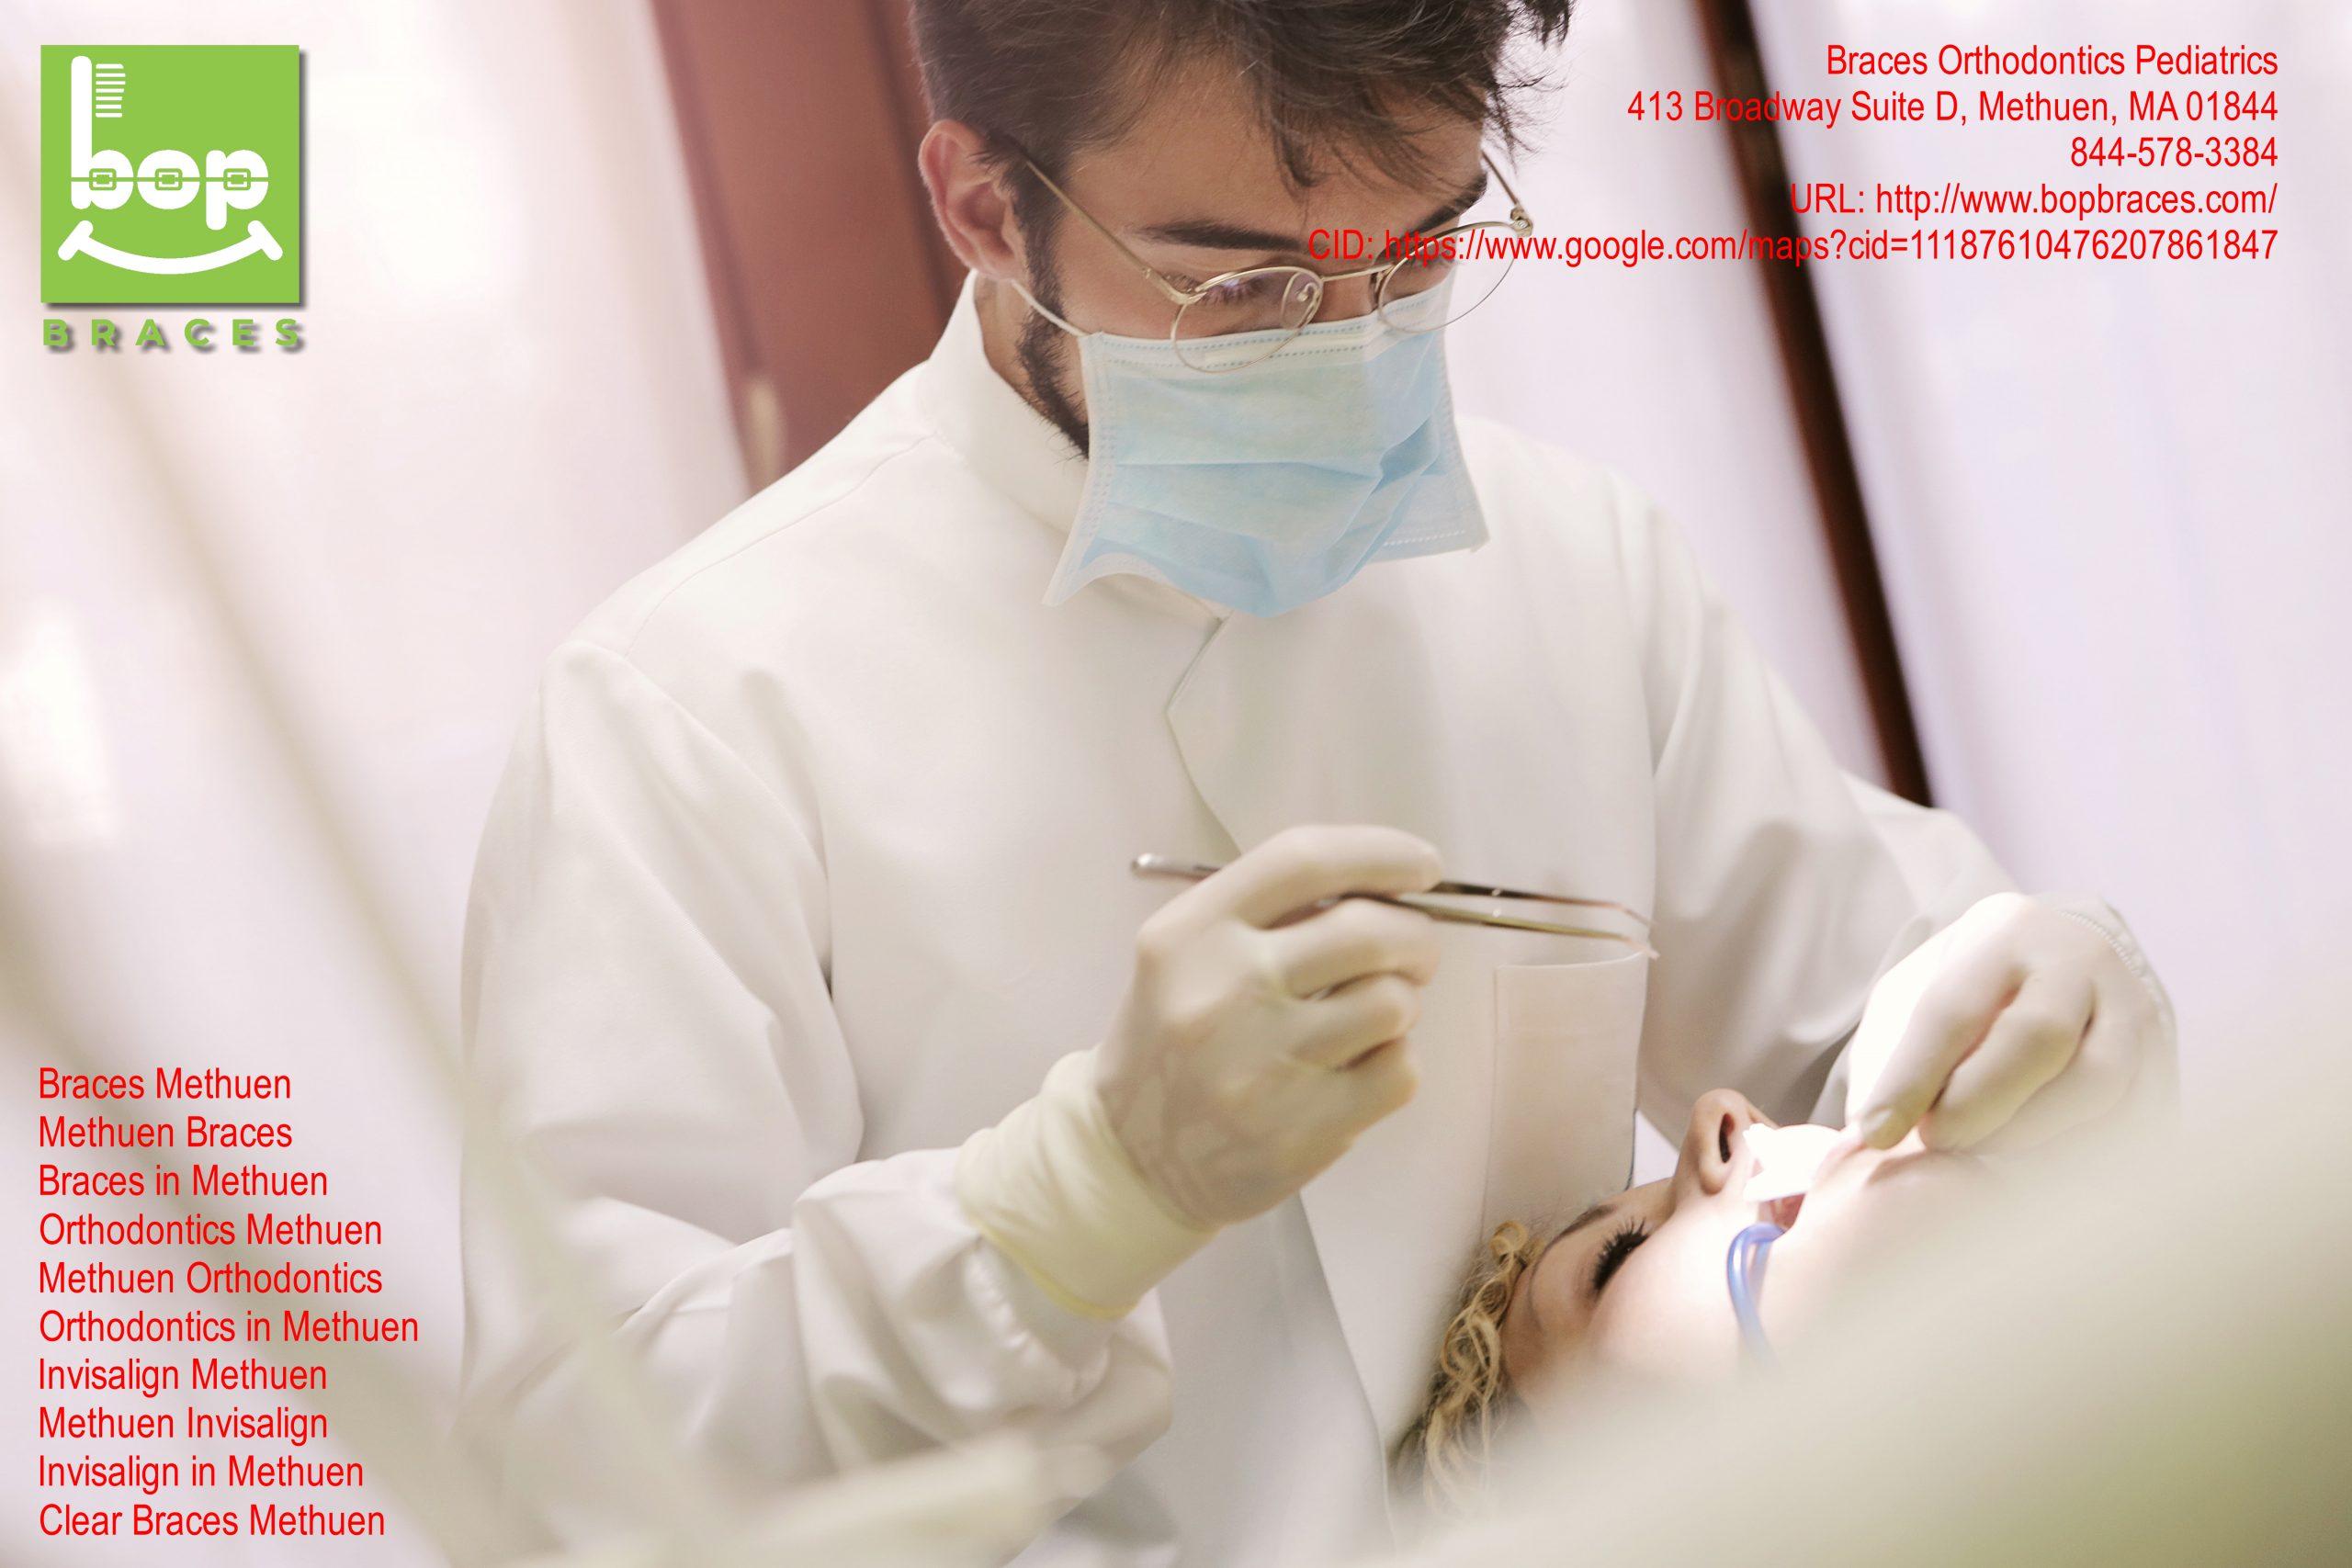 Braces Orthodontics Pediatrics – bop BRACES Offers the Best Braces to Improve Children's Smiles 1